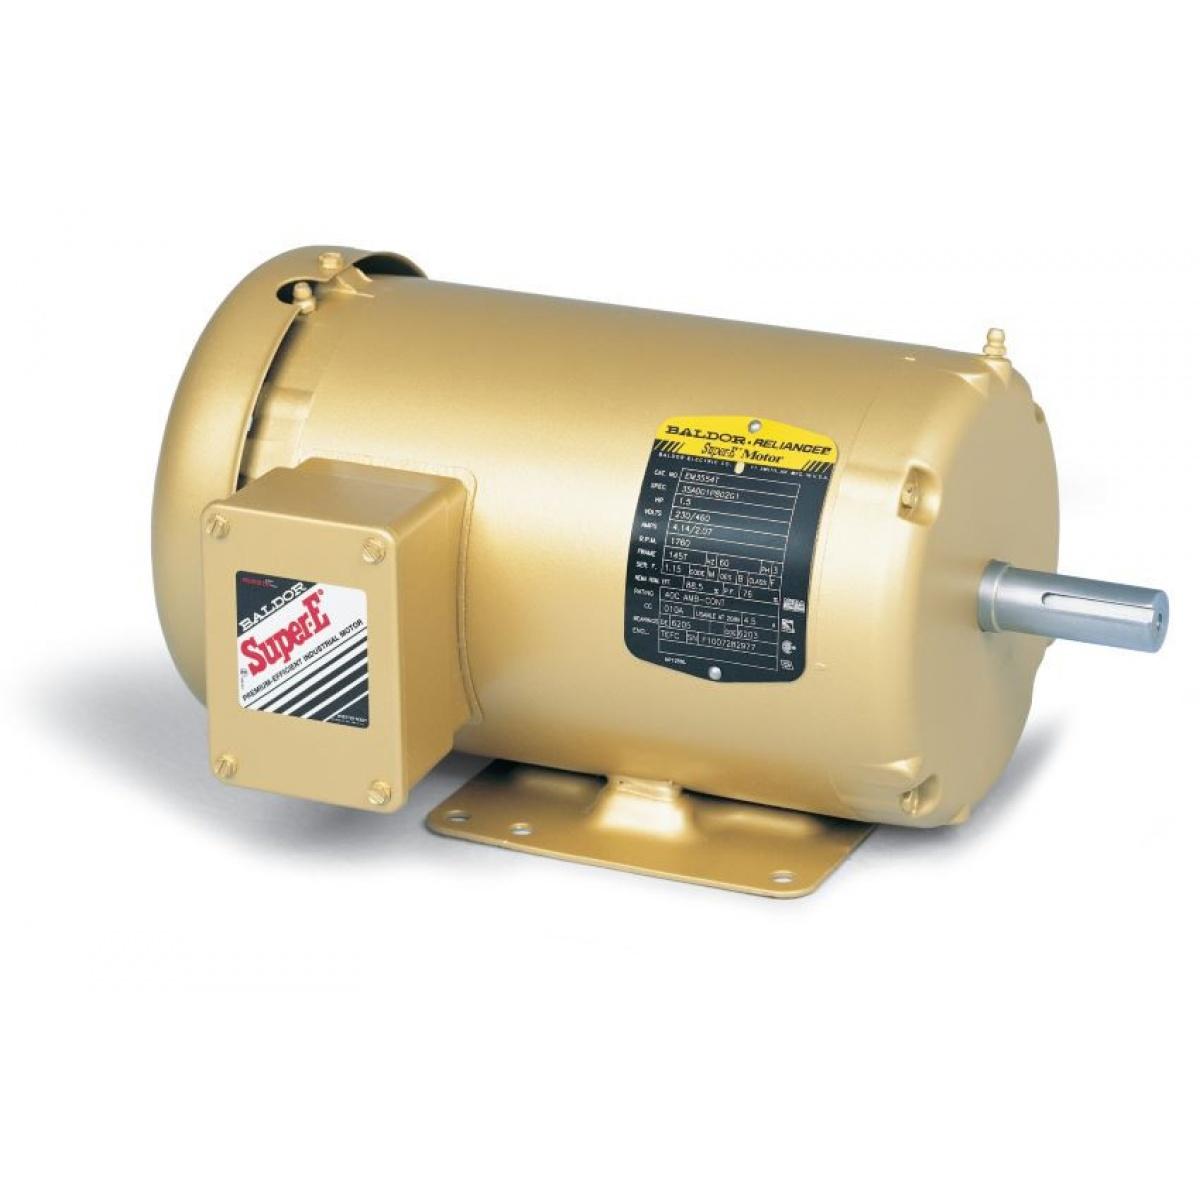 Motor, 10hp 3ph 230/460v, 1800rpm, Tefc,